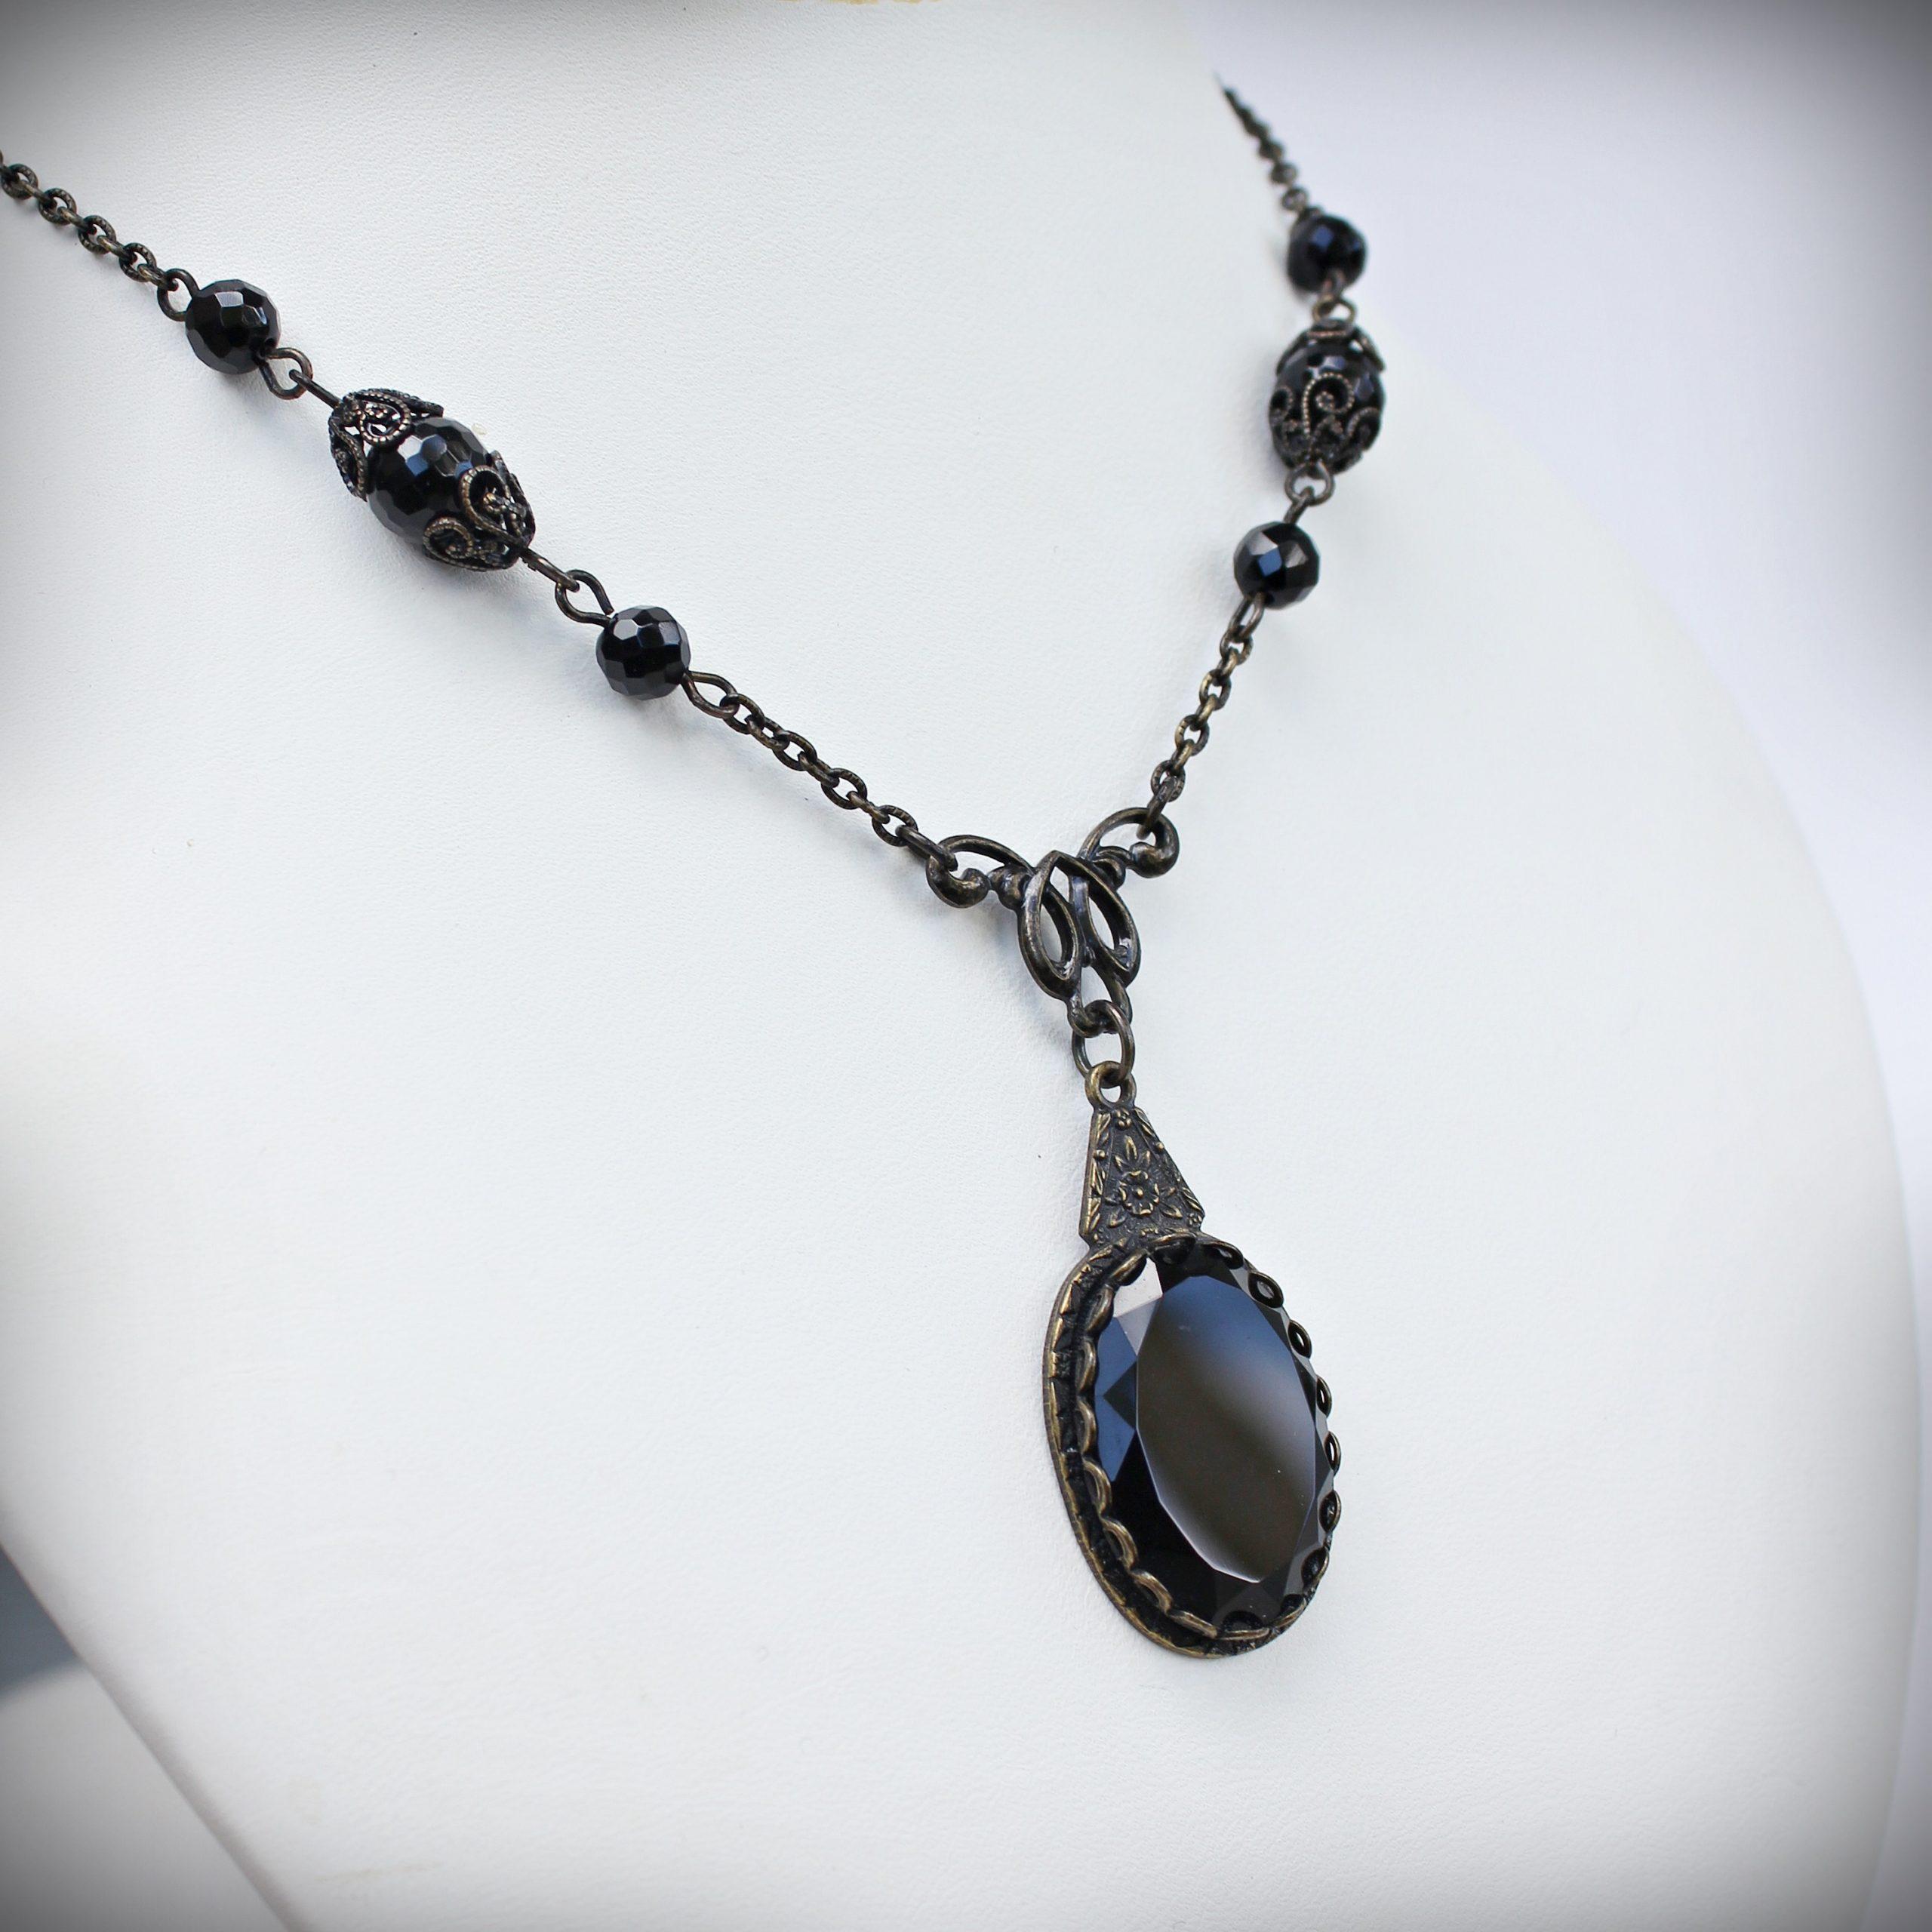 Vintage Style Faceted Black Onyx PendantNecklace